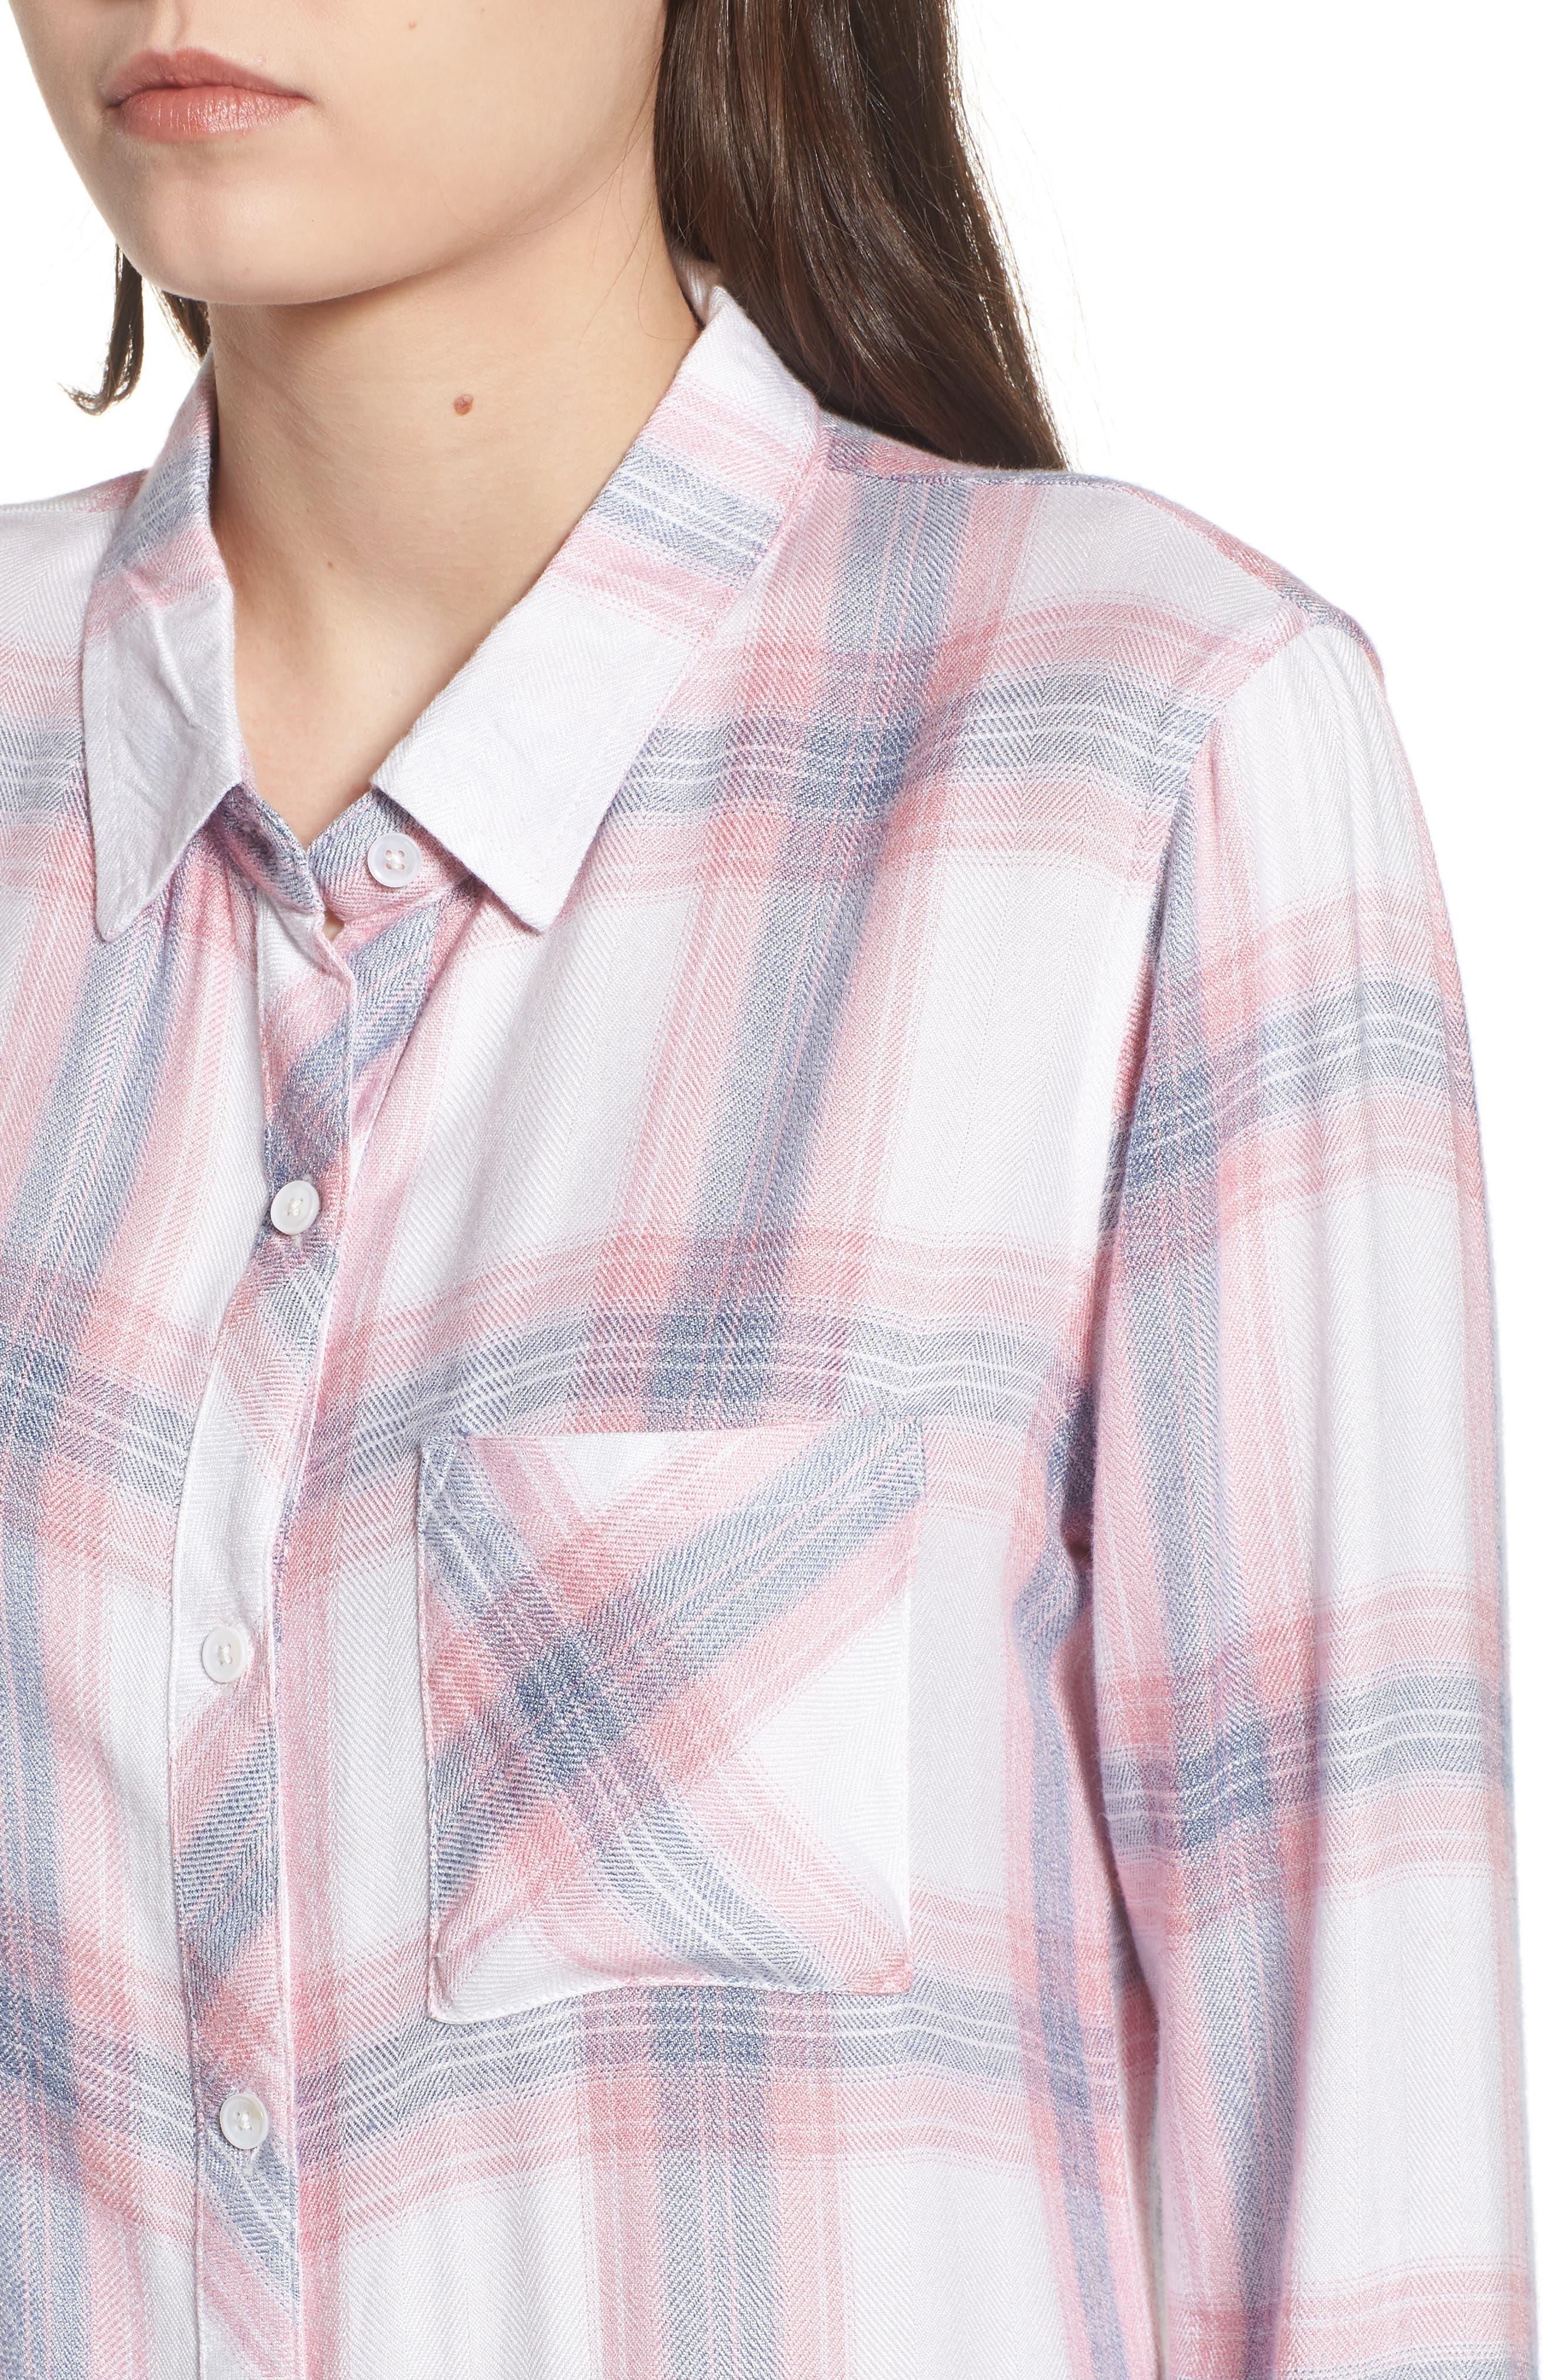 Carina Plaid Shirt,                             Alternate thumbnail 4, color,                             Red/ White Plaid